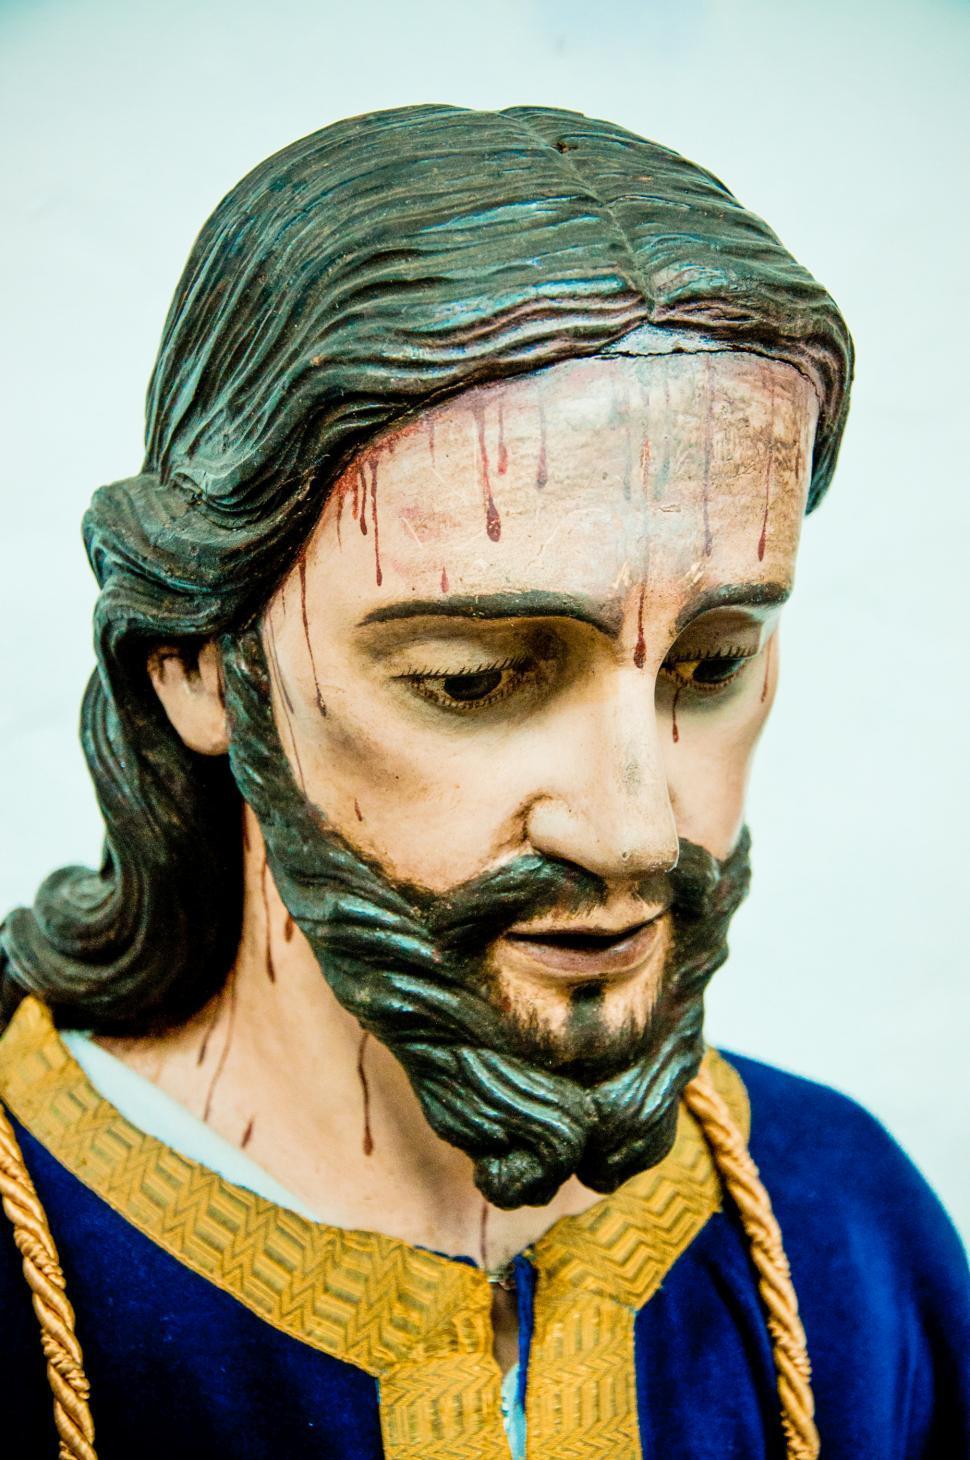 Download Free Stock Photo of Jesus head statue